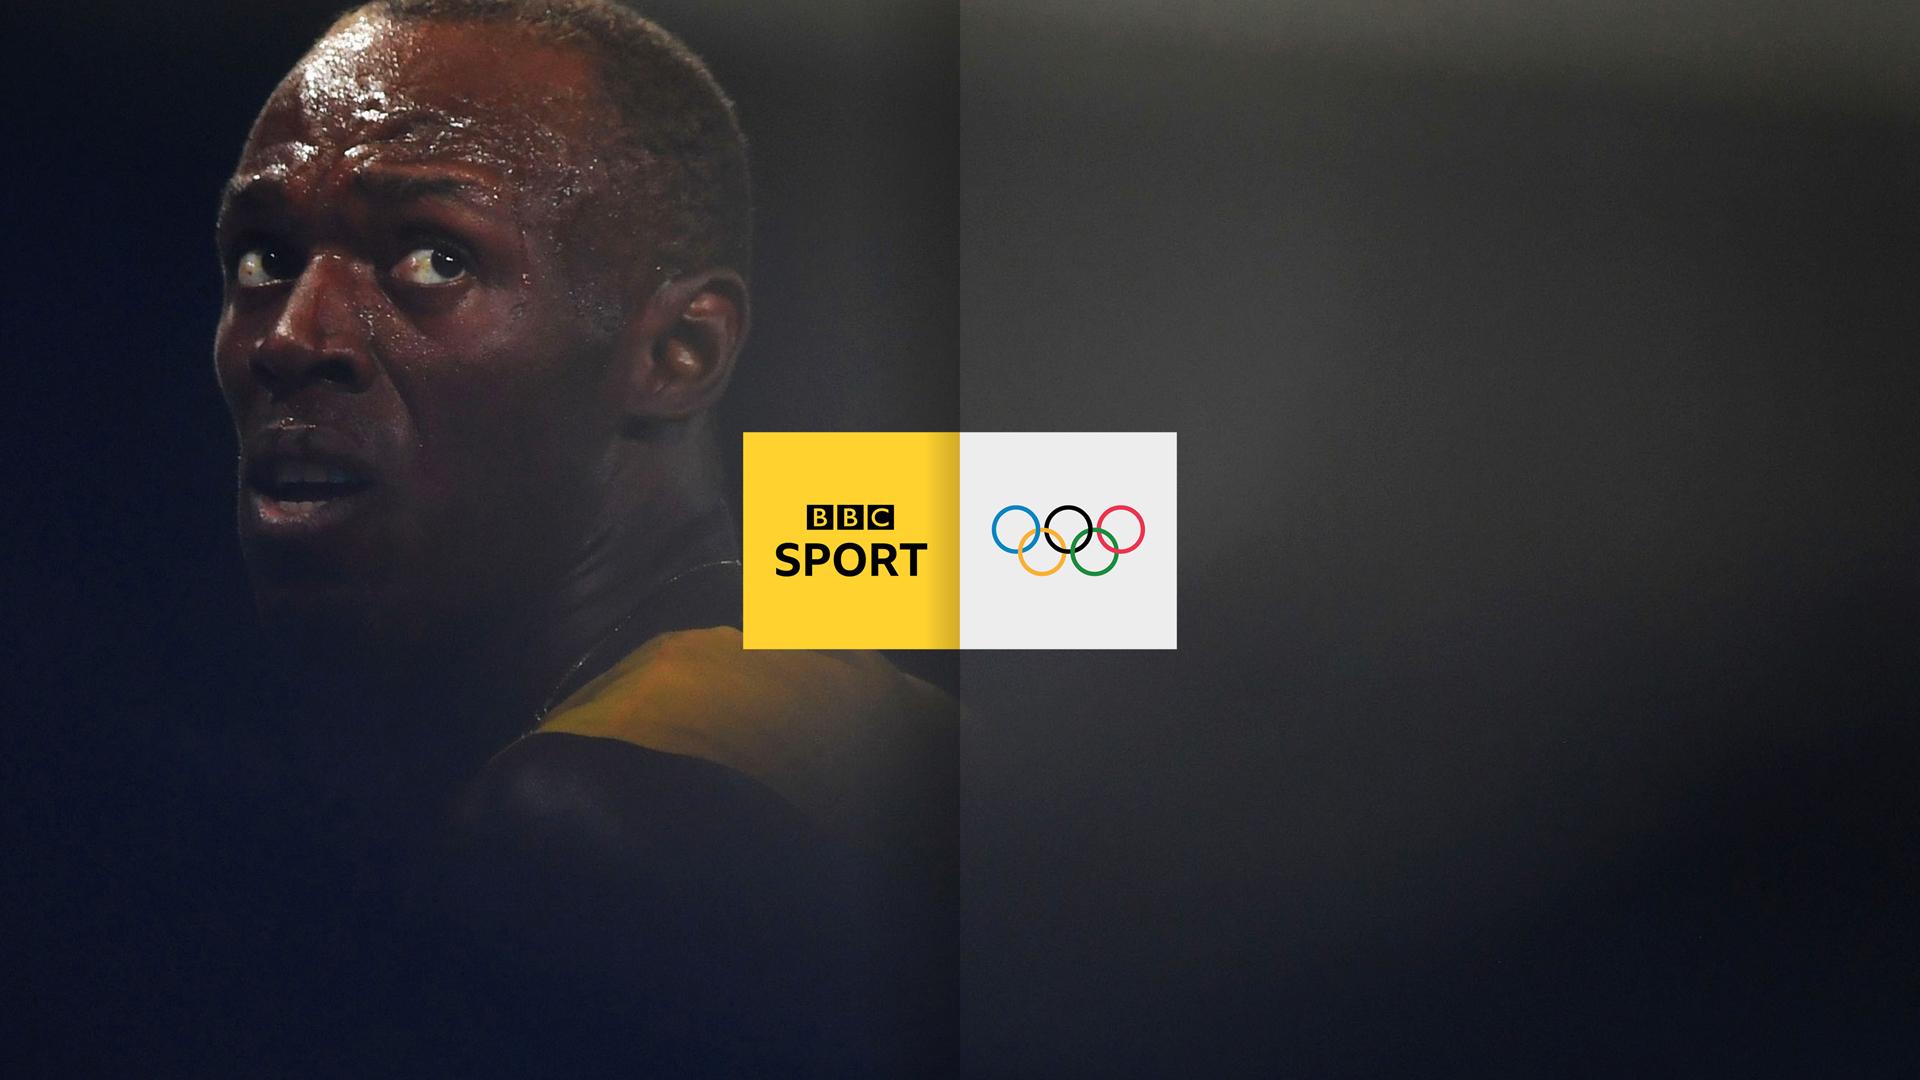 ncs_bbc-sport-rebrand_0001